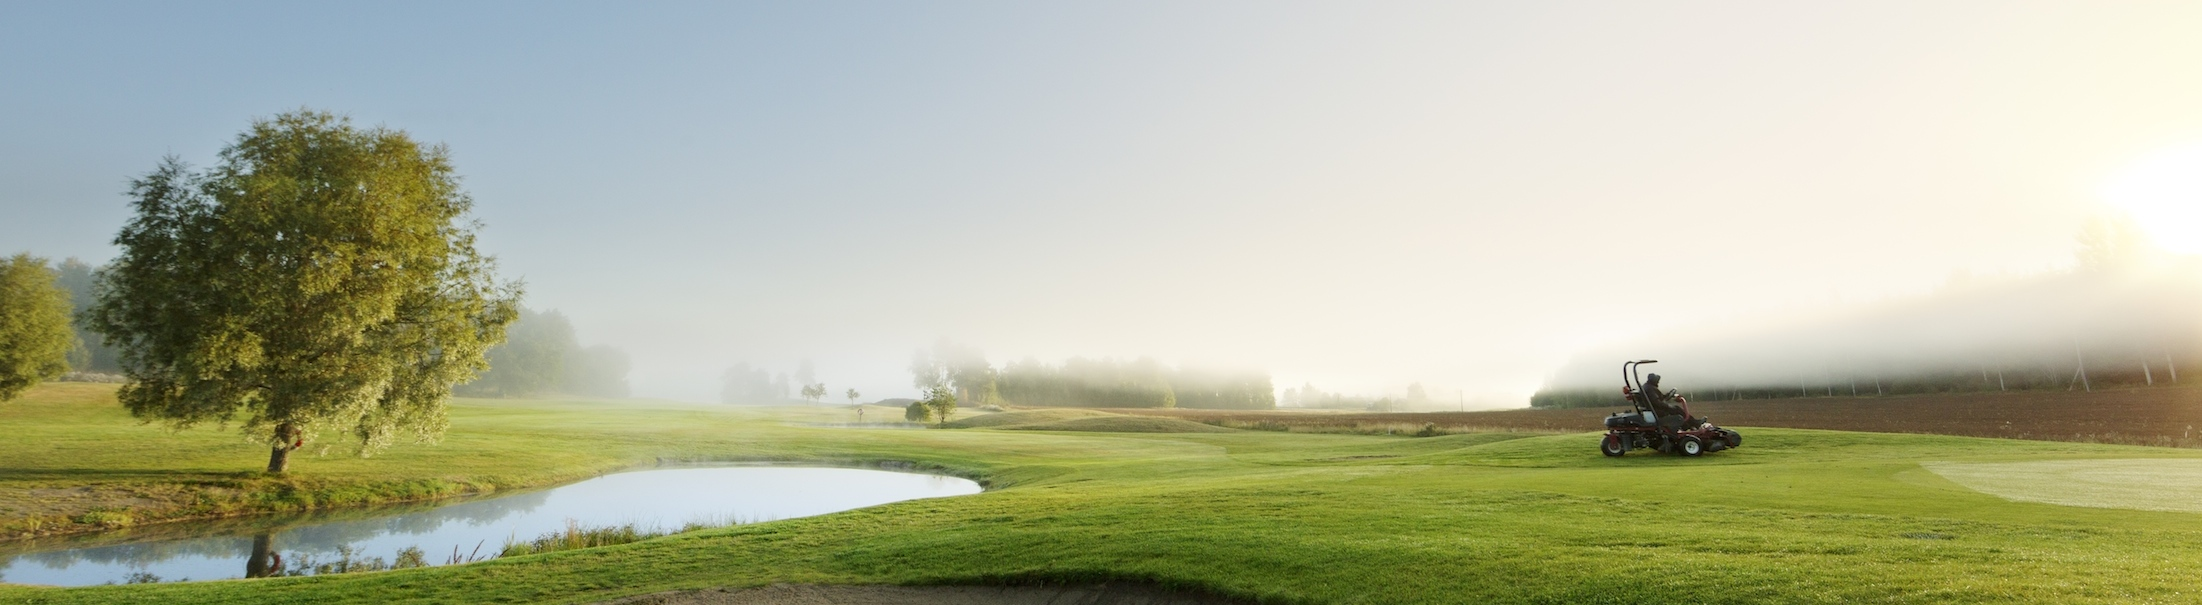 HaningeStrand Golfklubb